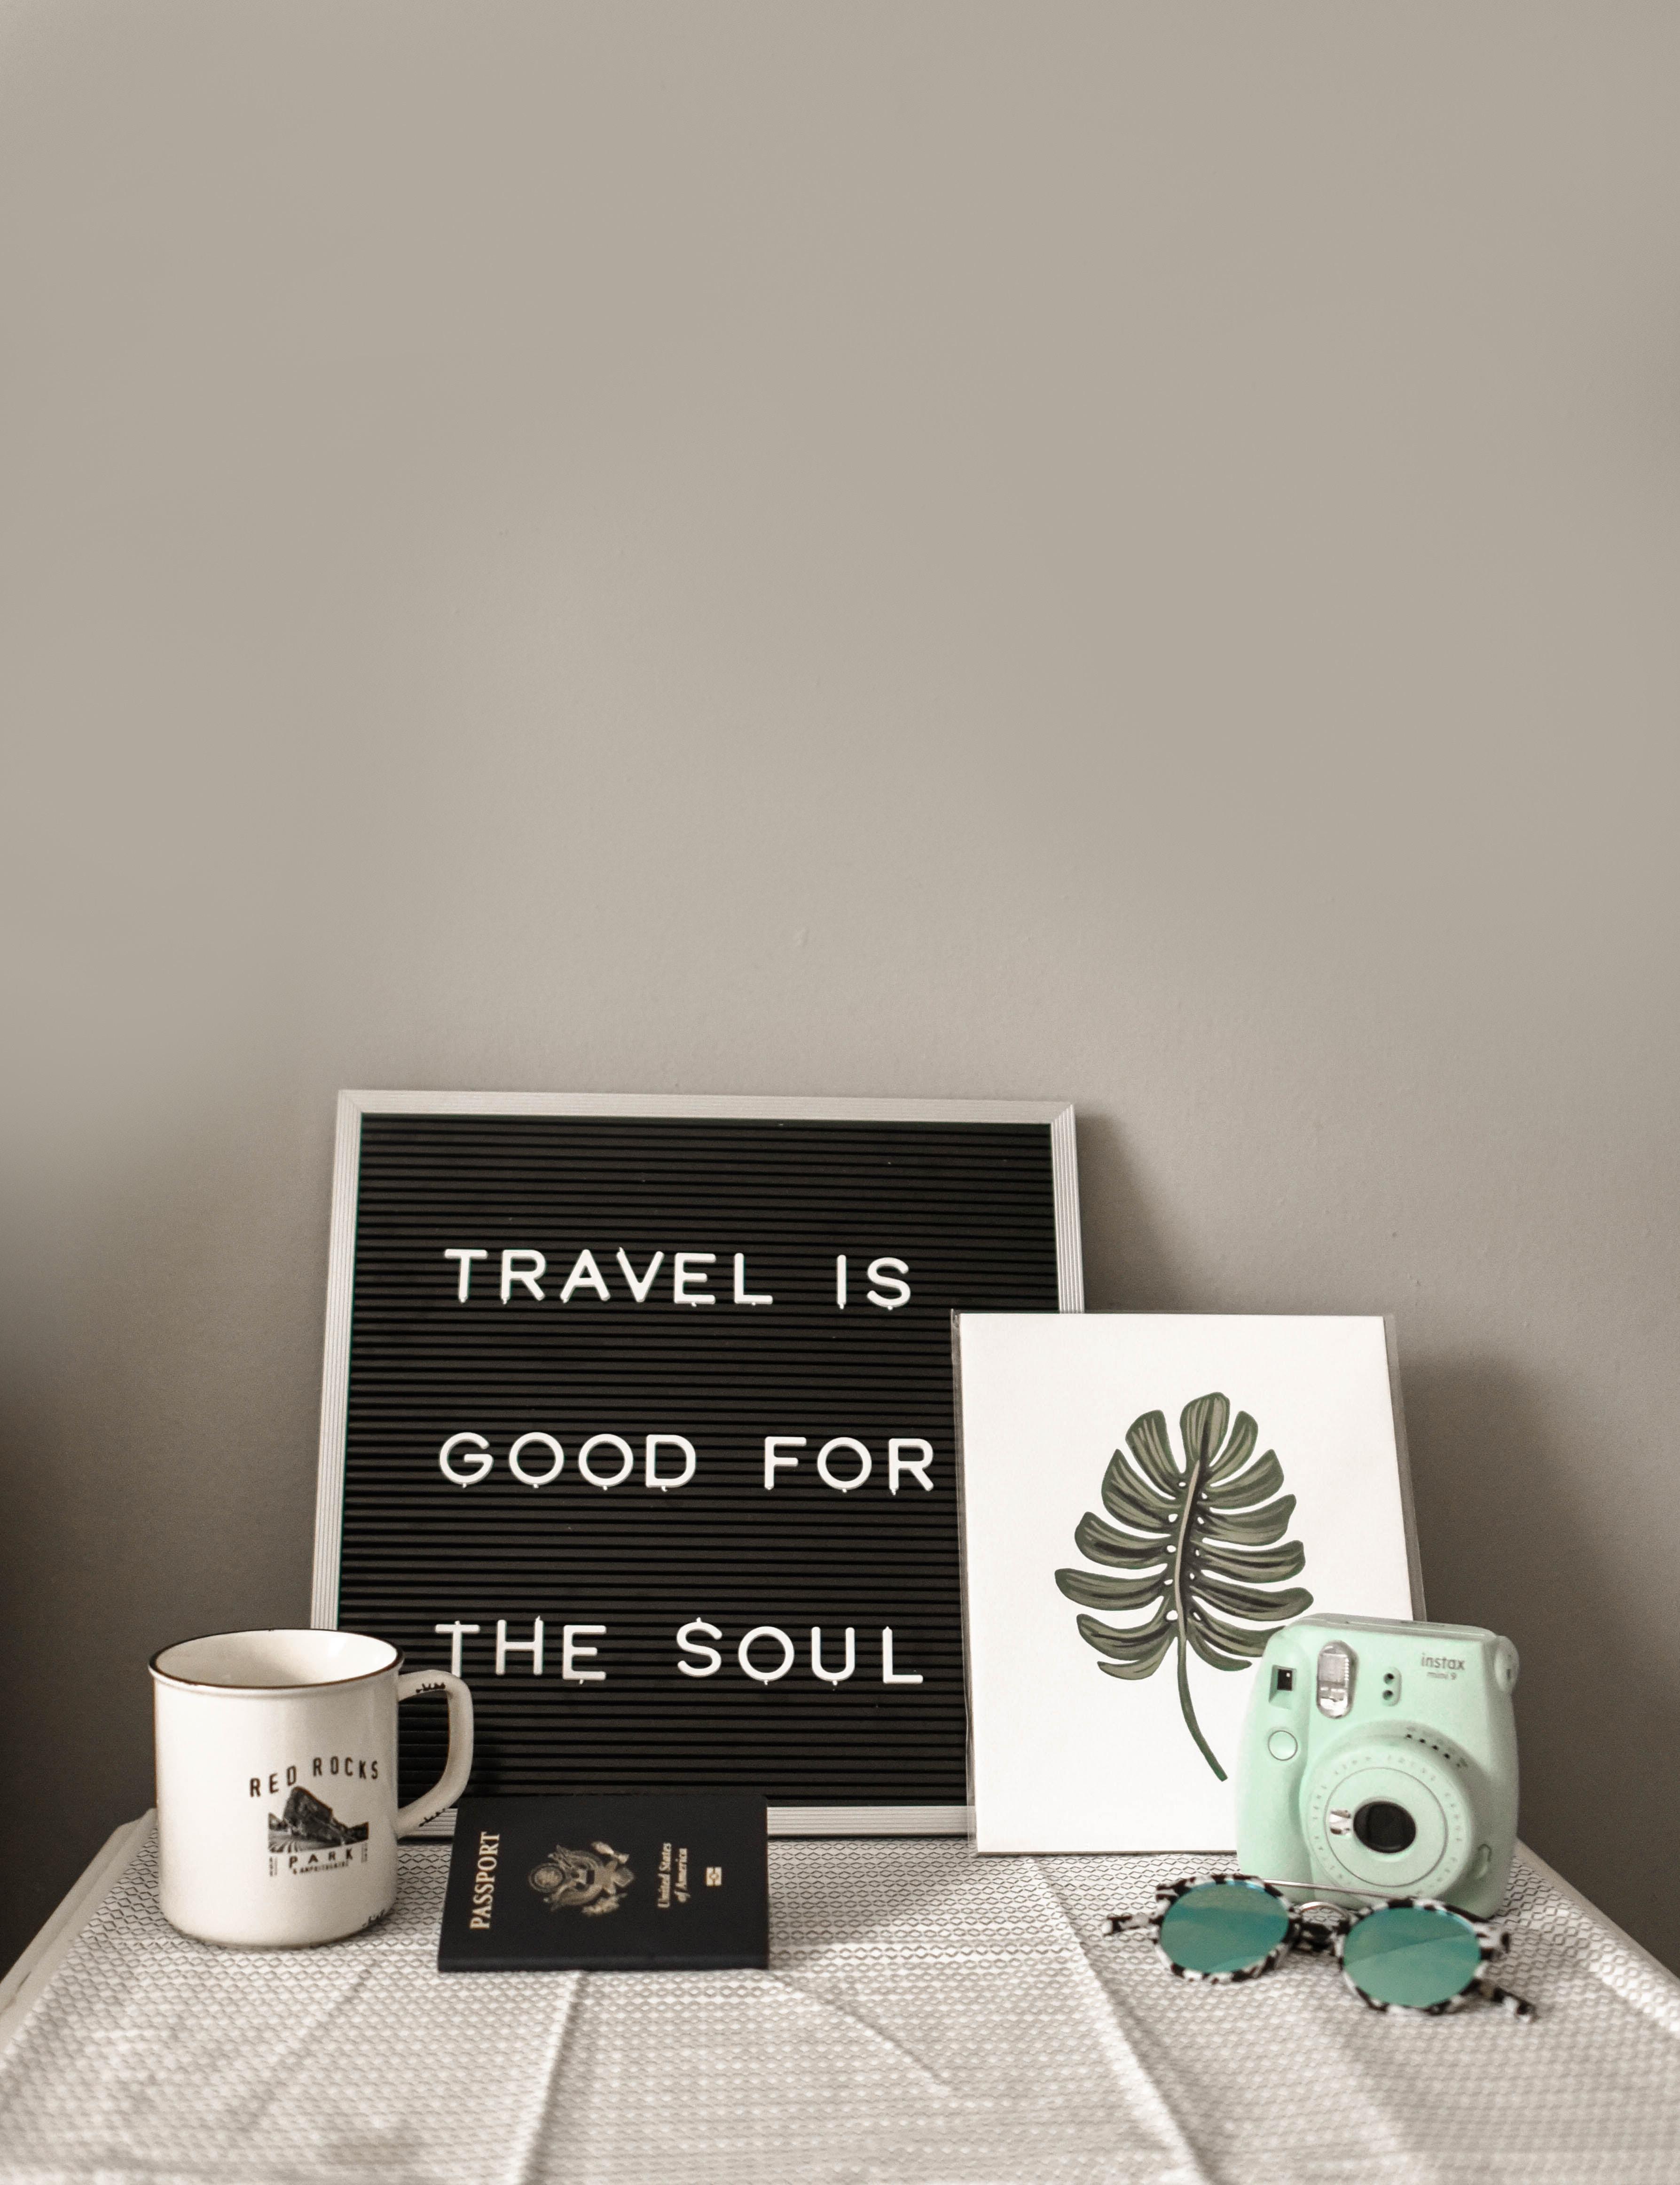 Travel is good